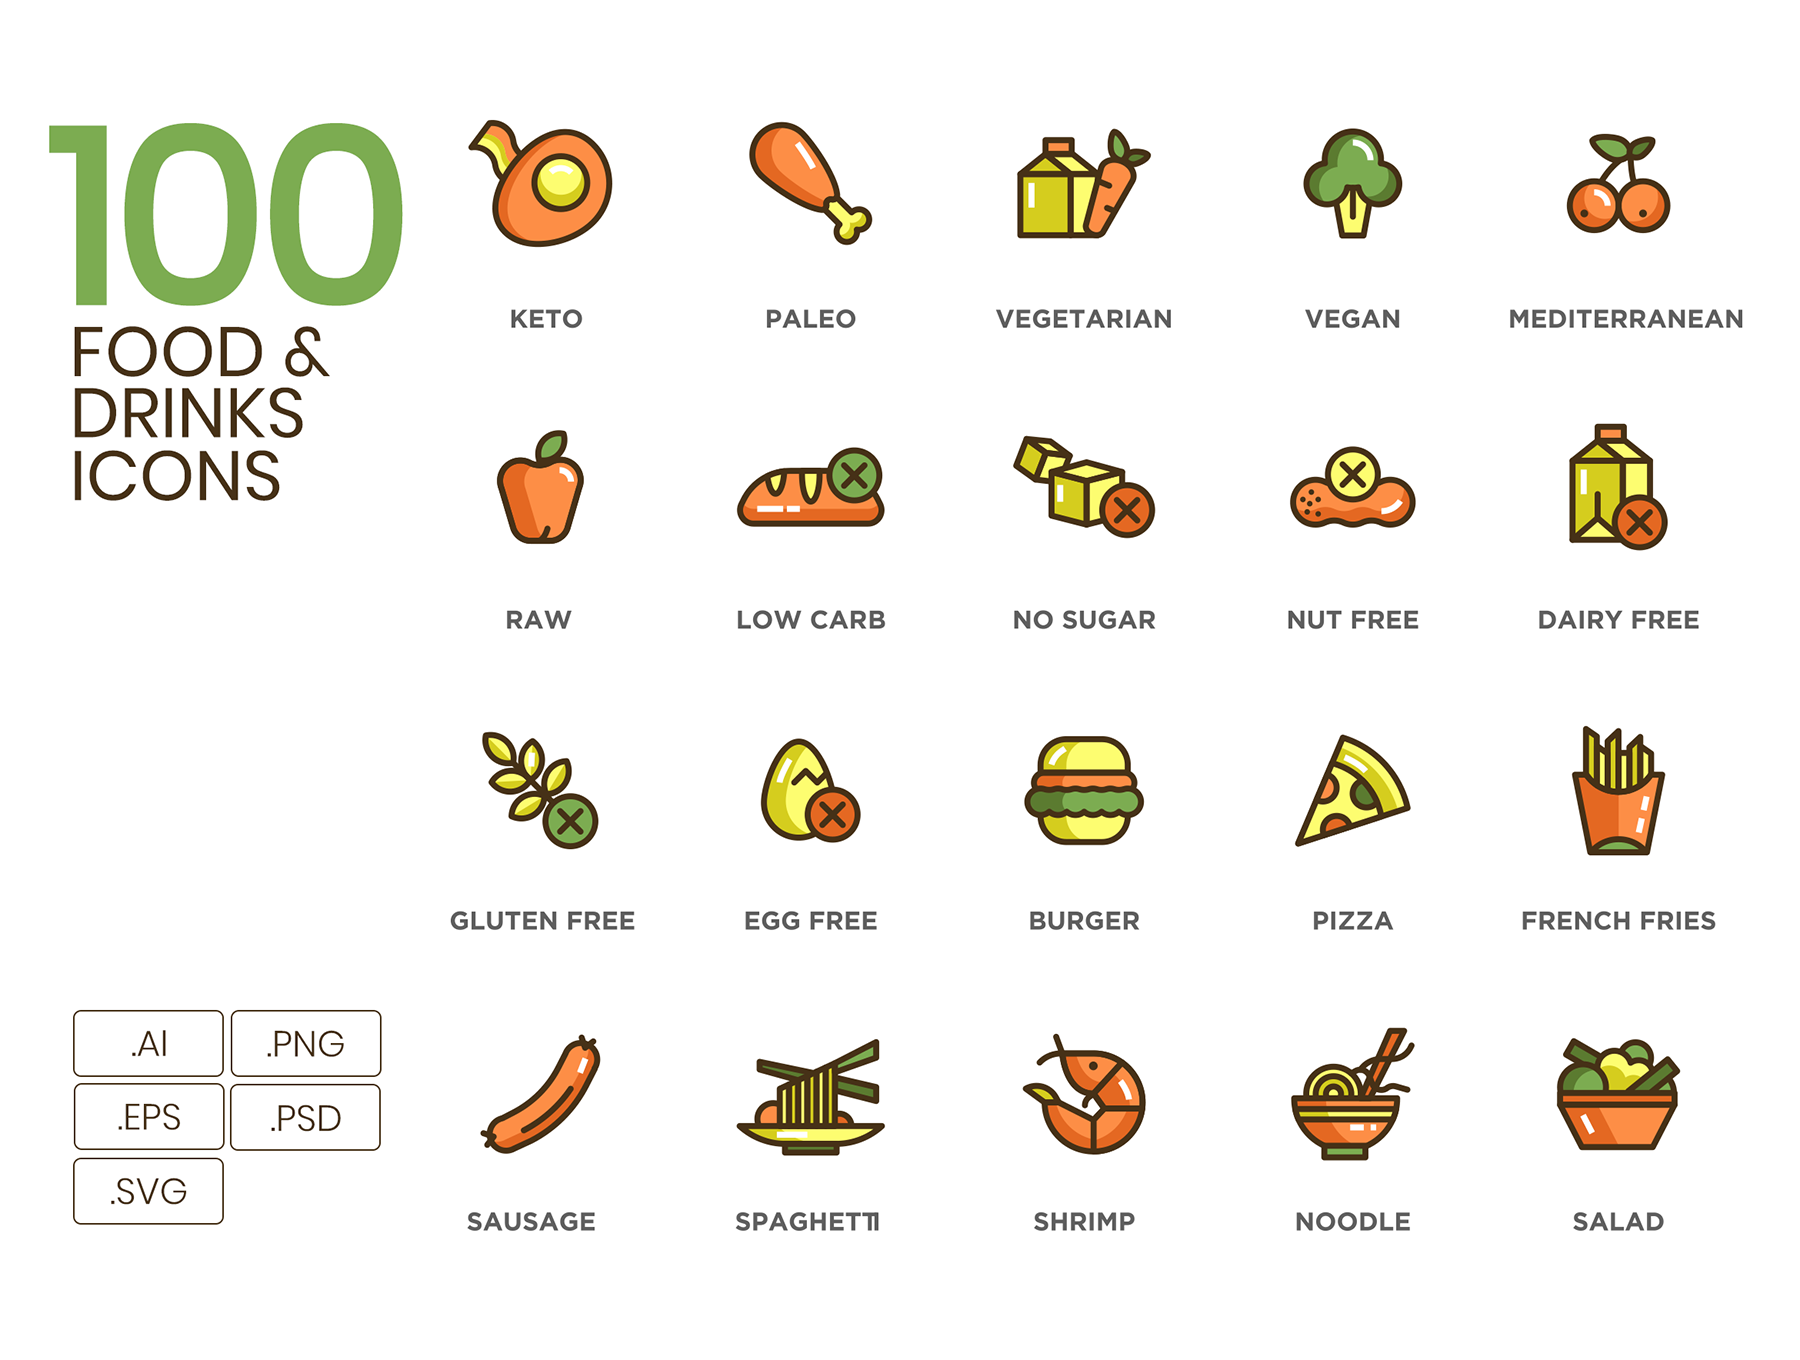 100 Food & Drinks Icons — Icons on UI8